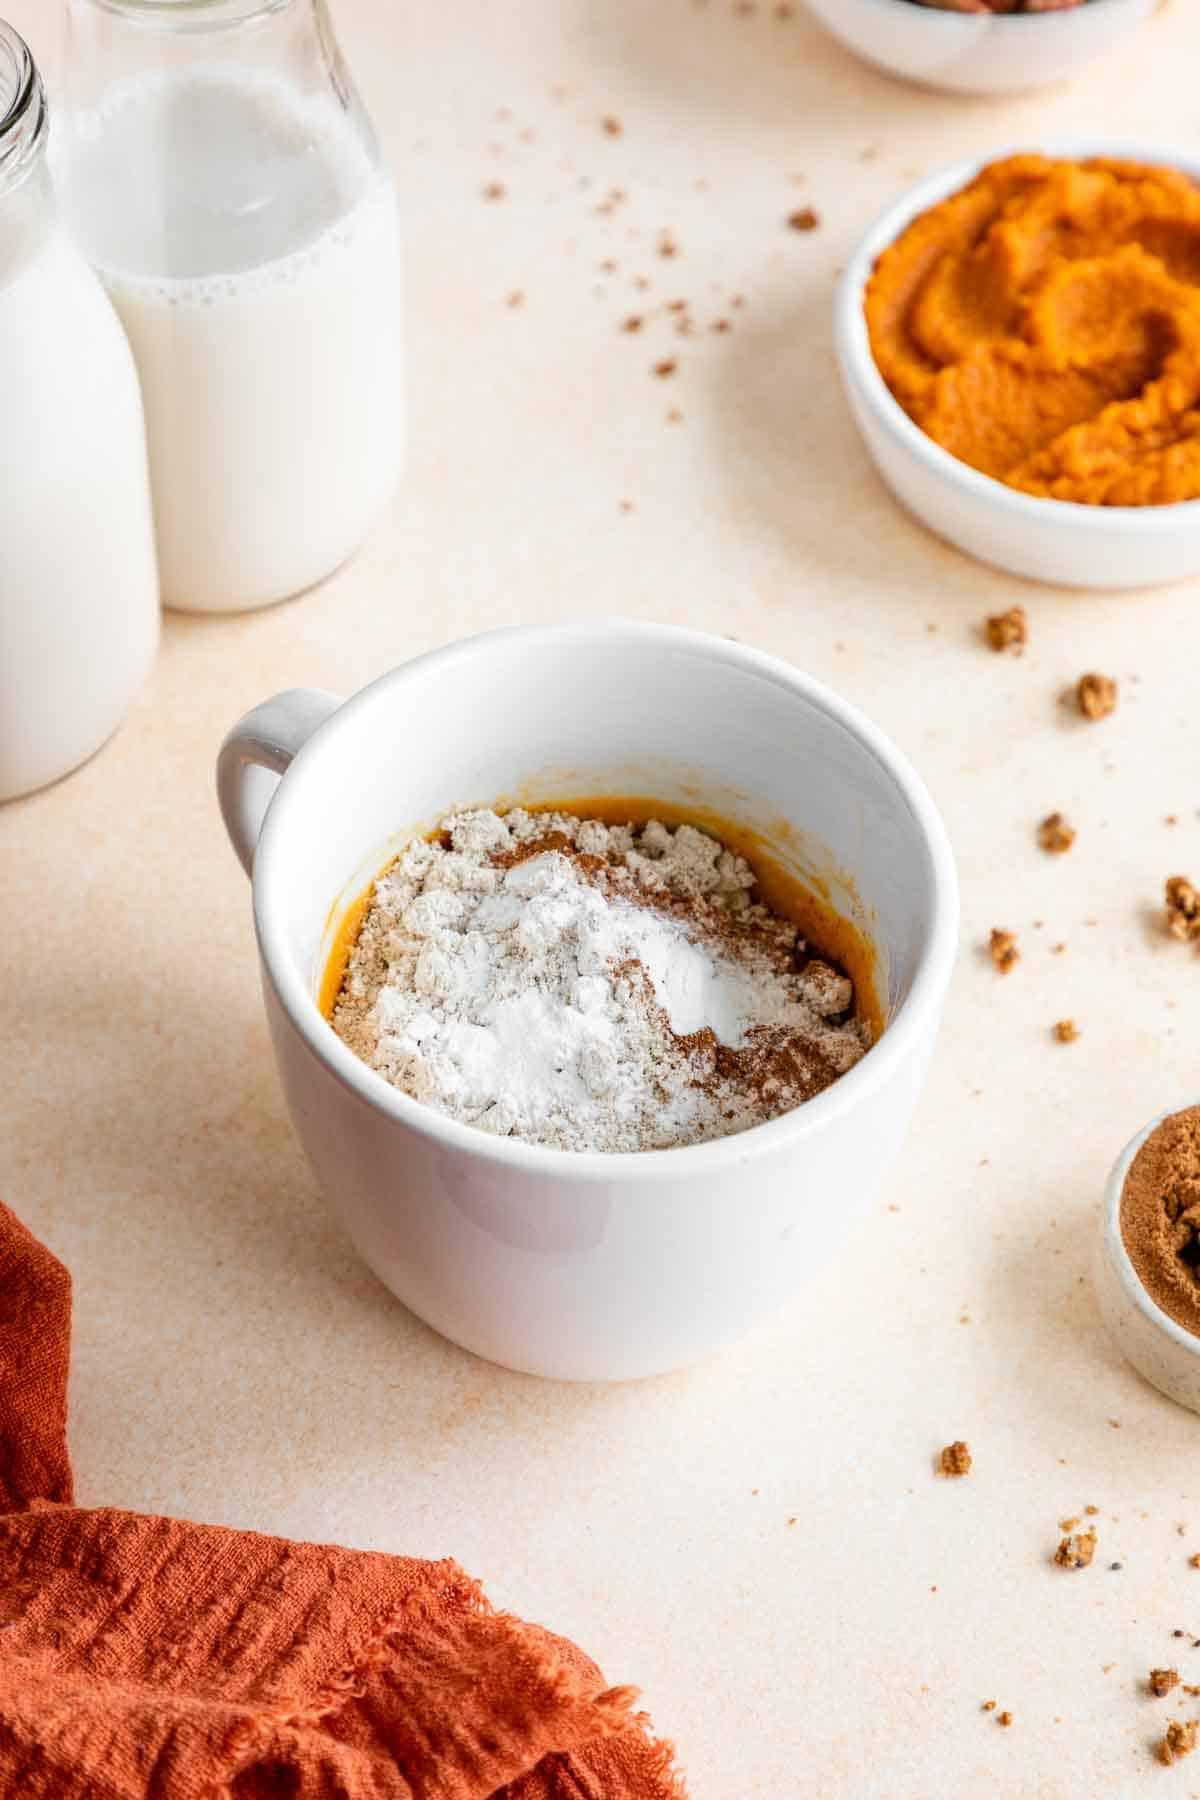 oat flour and pumpkin cake batter in a white mug